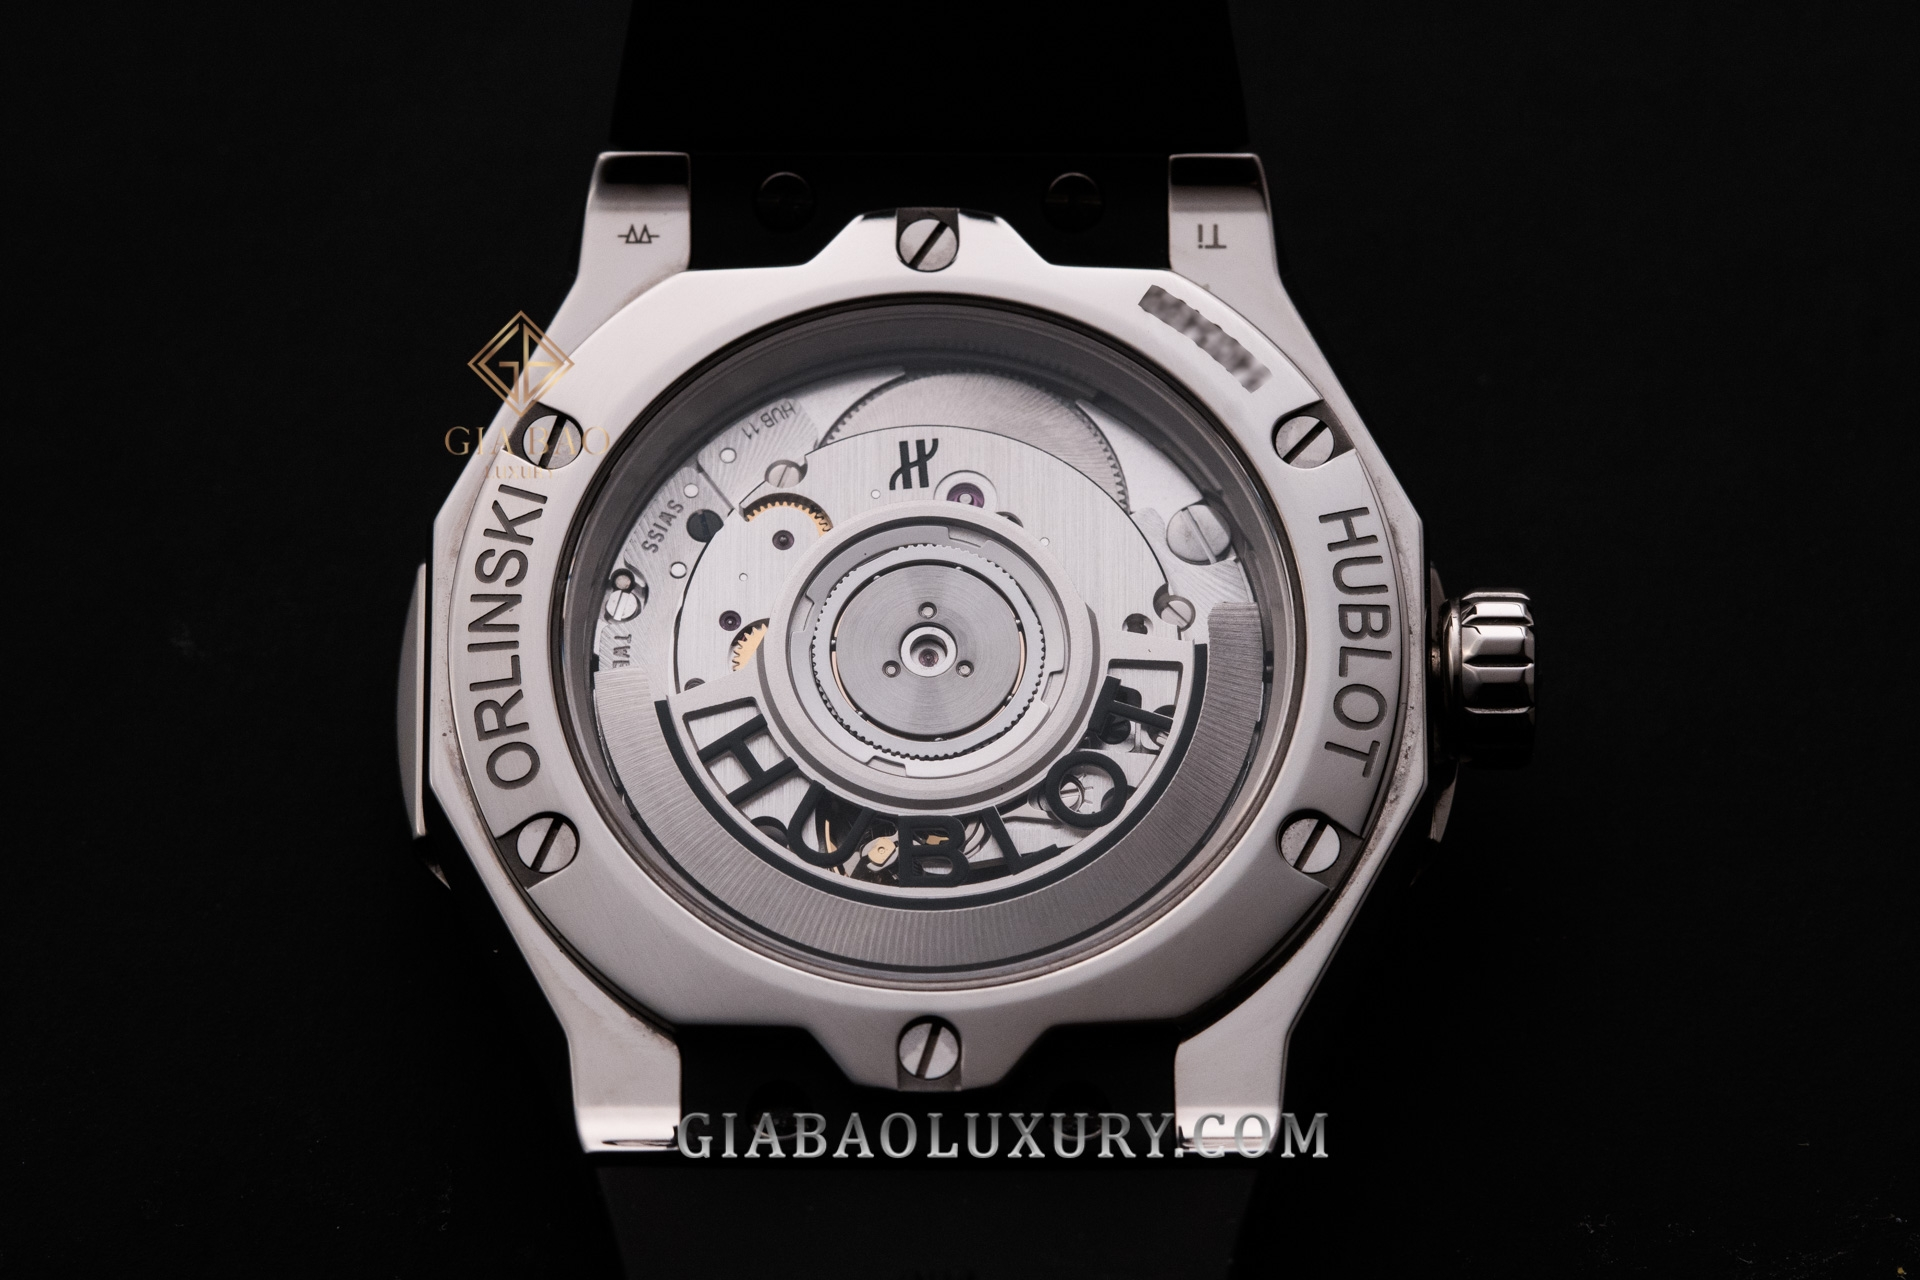 Đồng Hồ Hublot Classic Fusion Orlinski Titanium 40mm 550.NS.1800.RX.ORL19